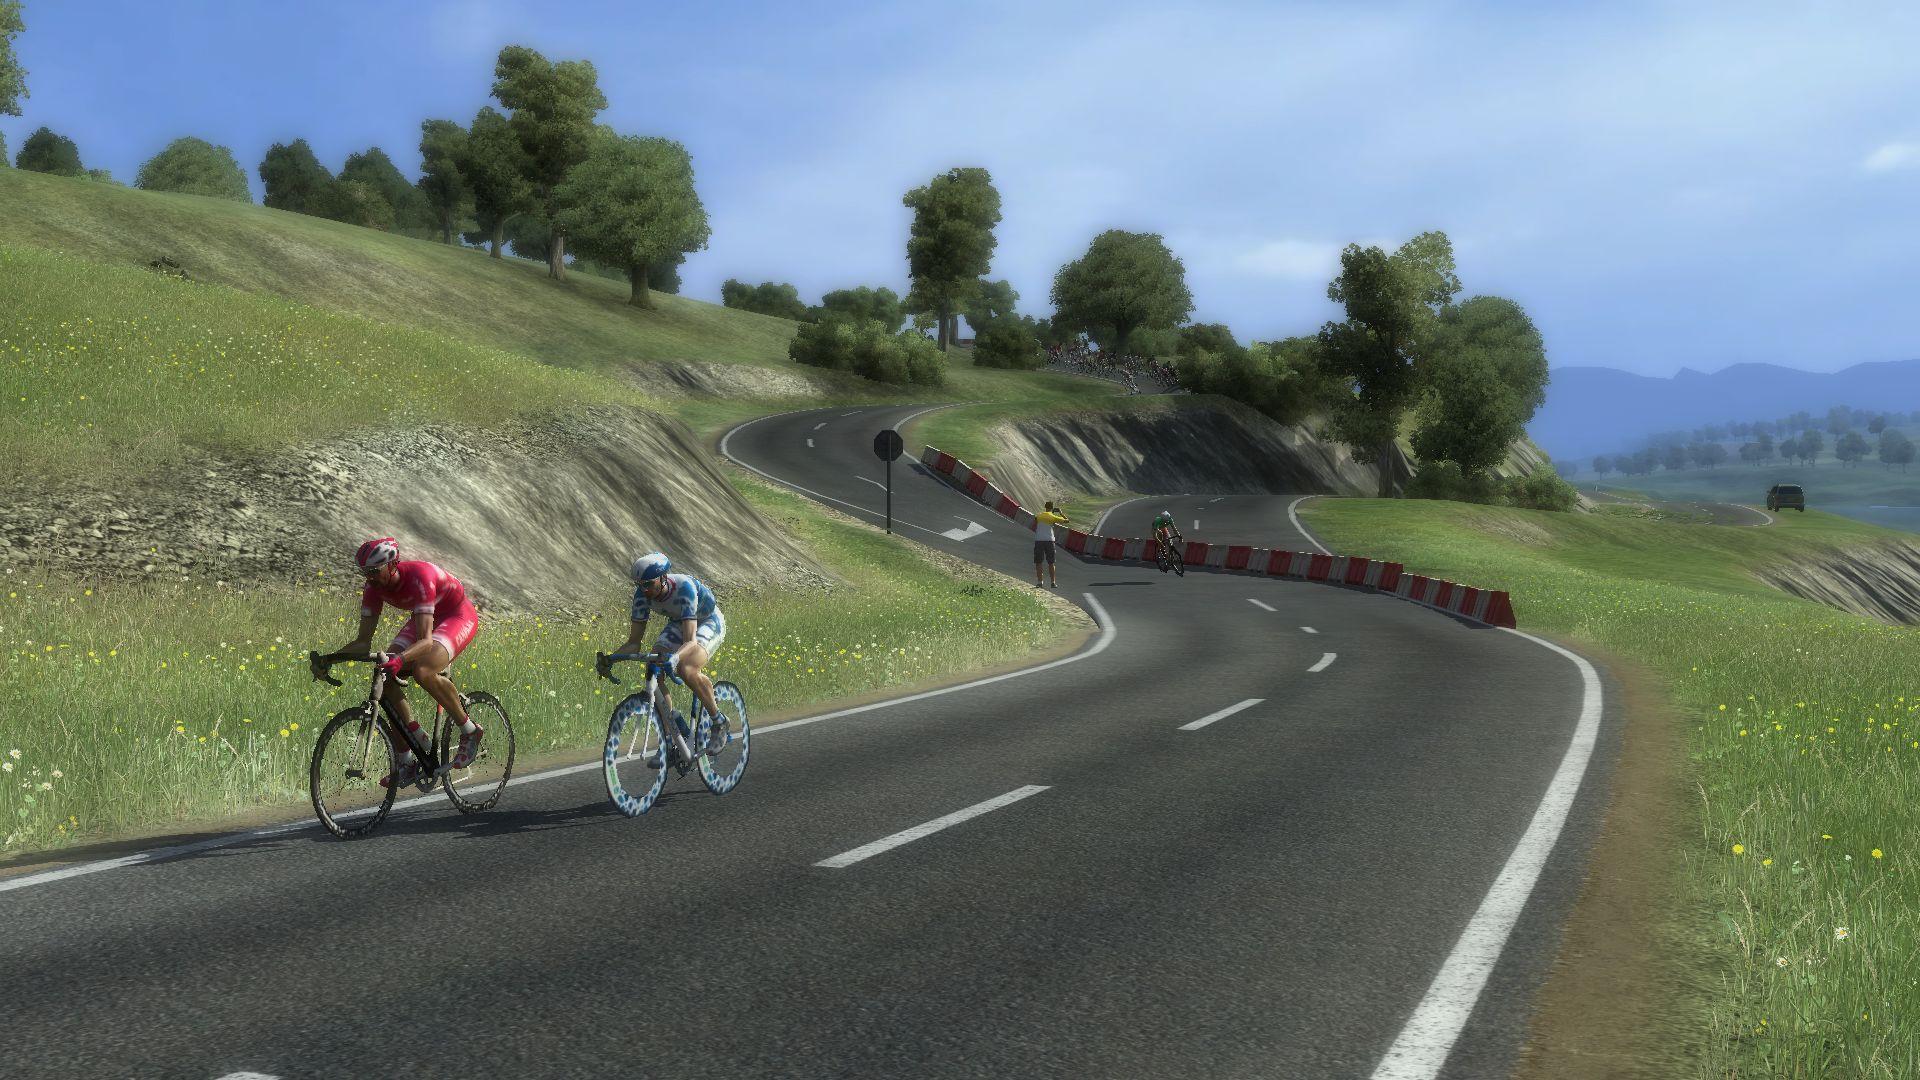 pcmdaily.com/images/mg/2018/Races/C2HC/Zuri/Zuri%2020.jpg